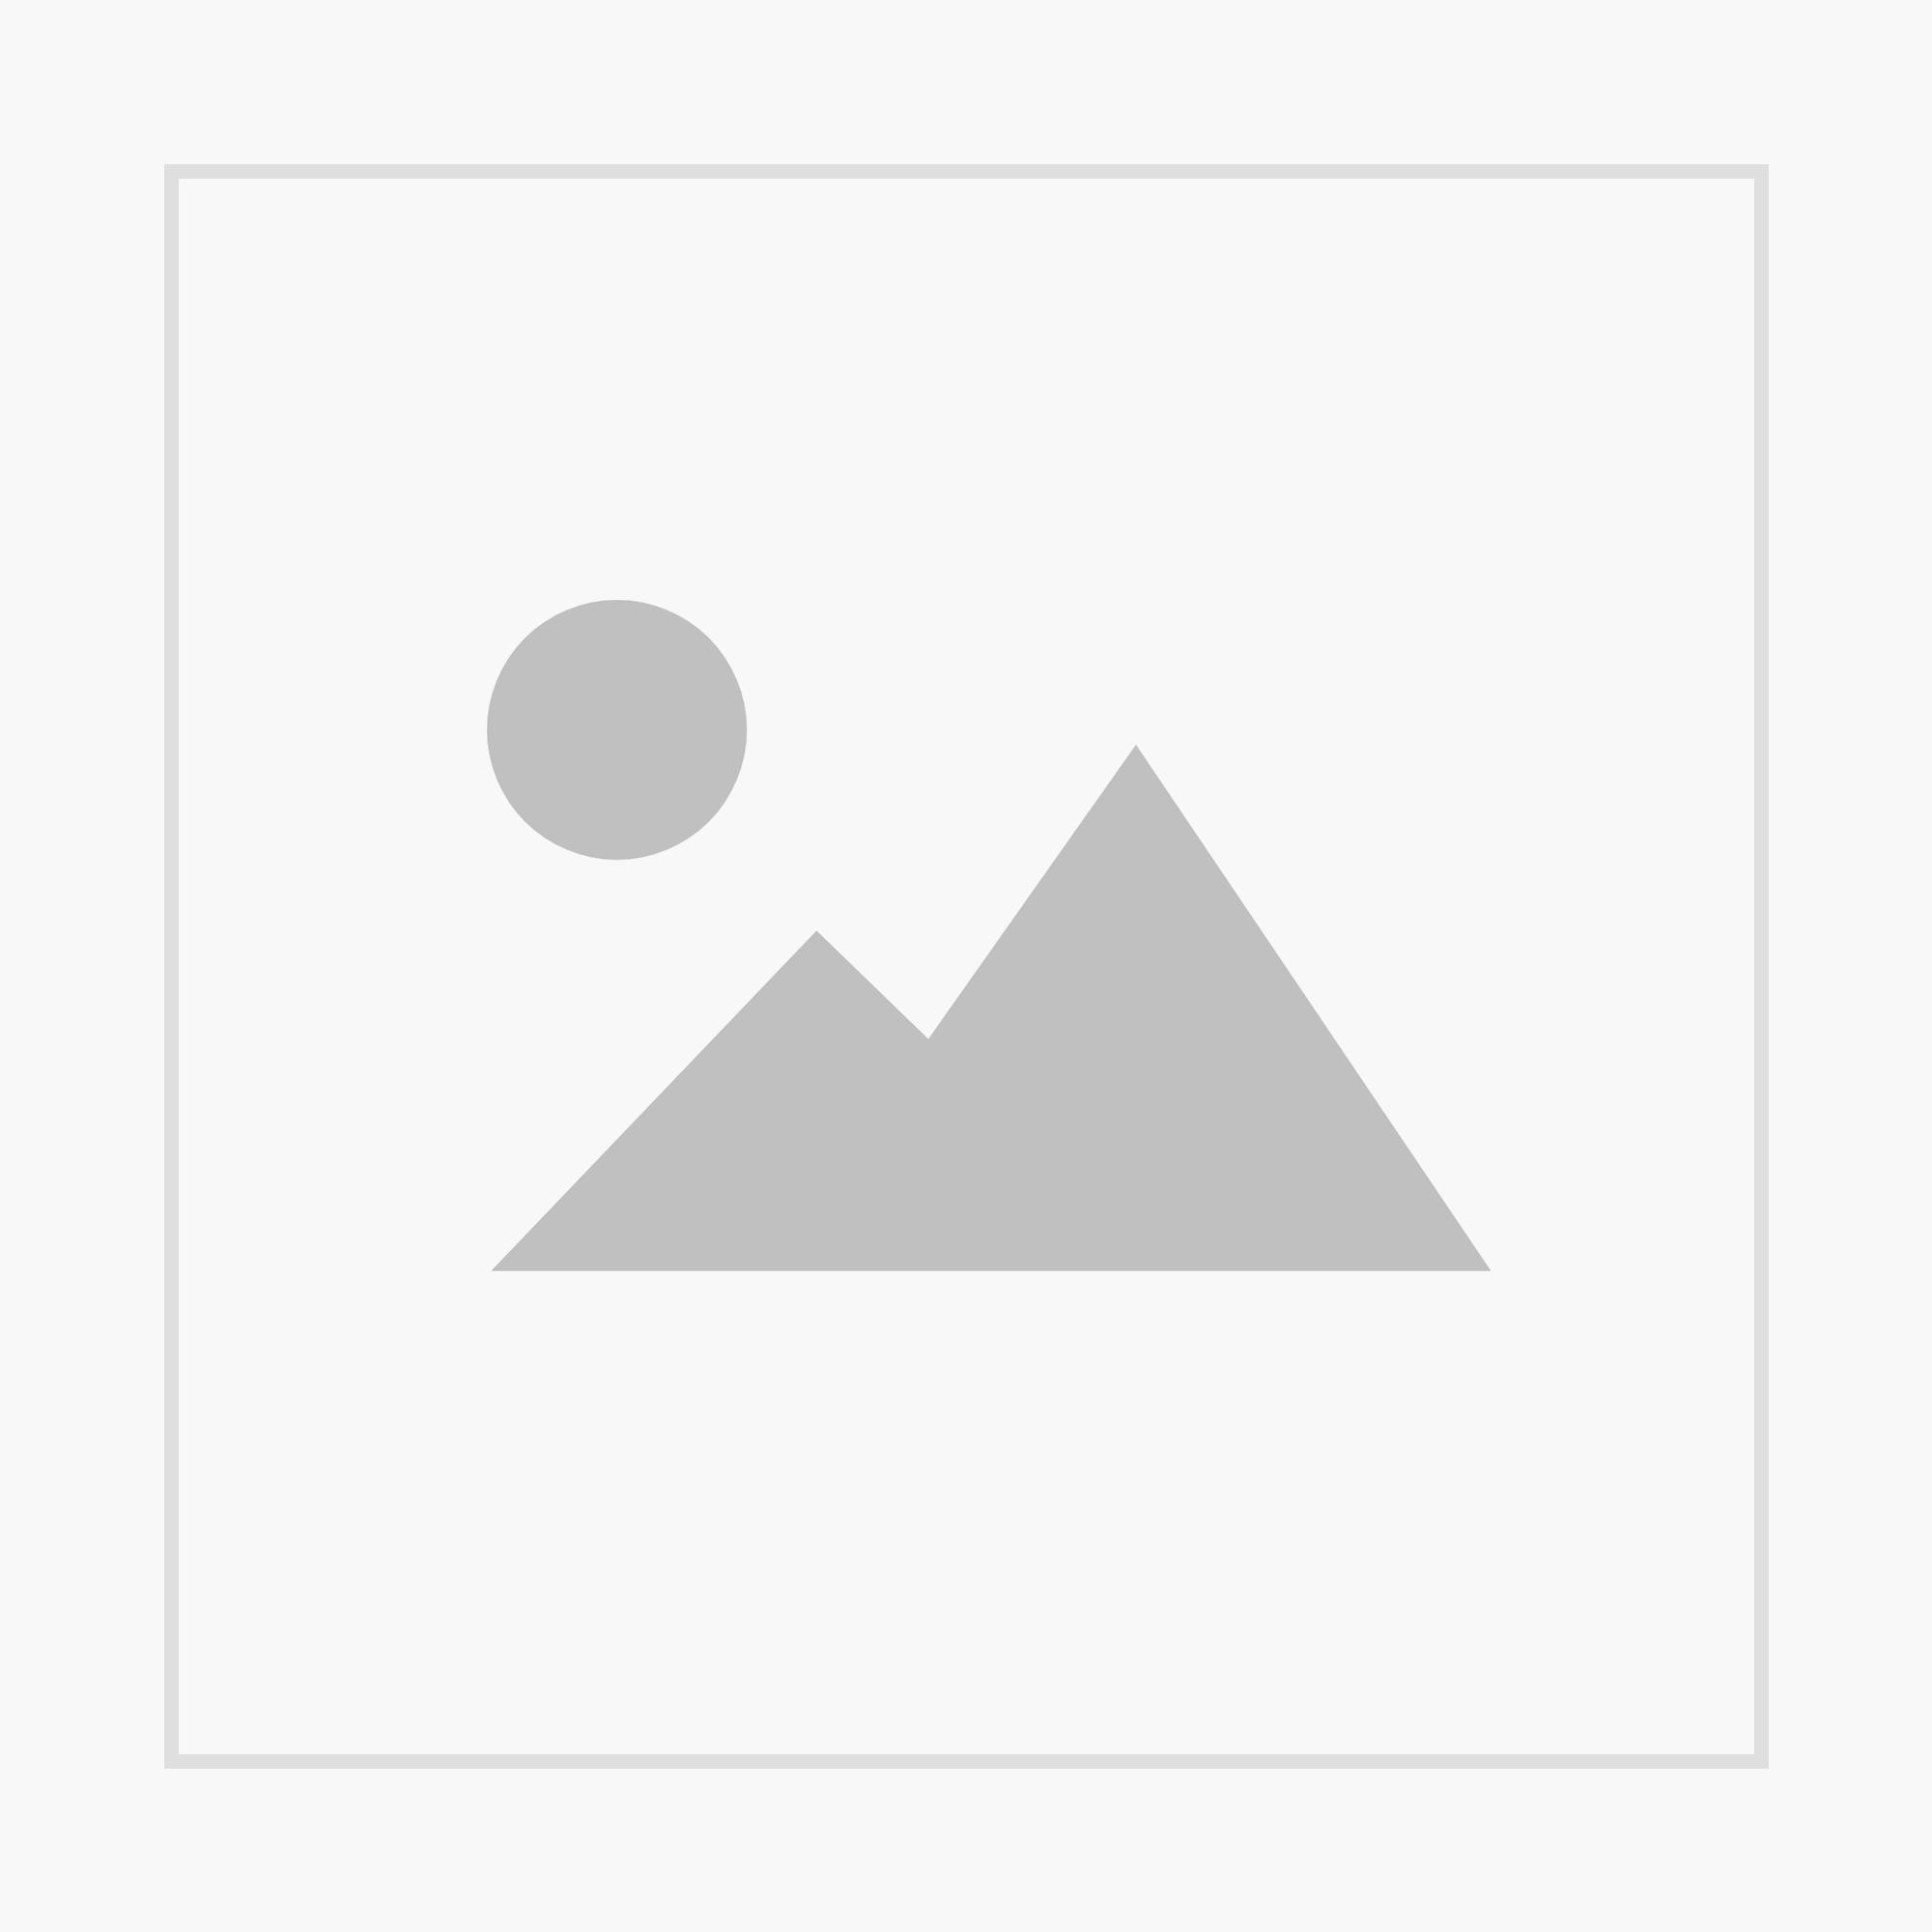 LuN Heft 69/2: Das europäische Schutzgebietssystem NATURA 2000. Bd. 2: Wirbeltiere